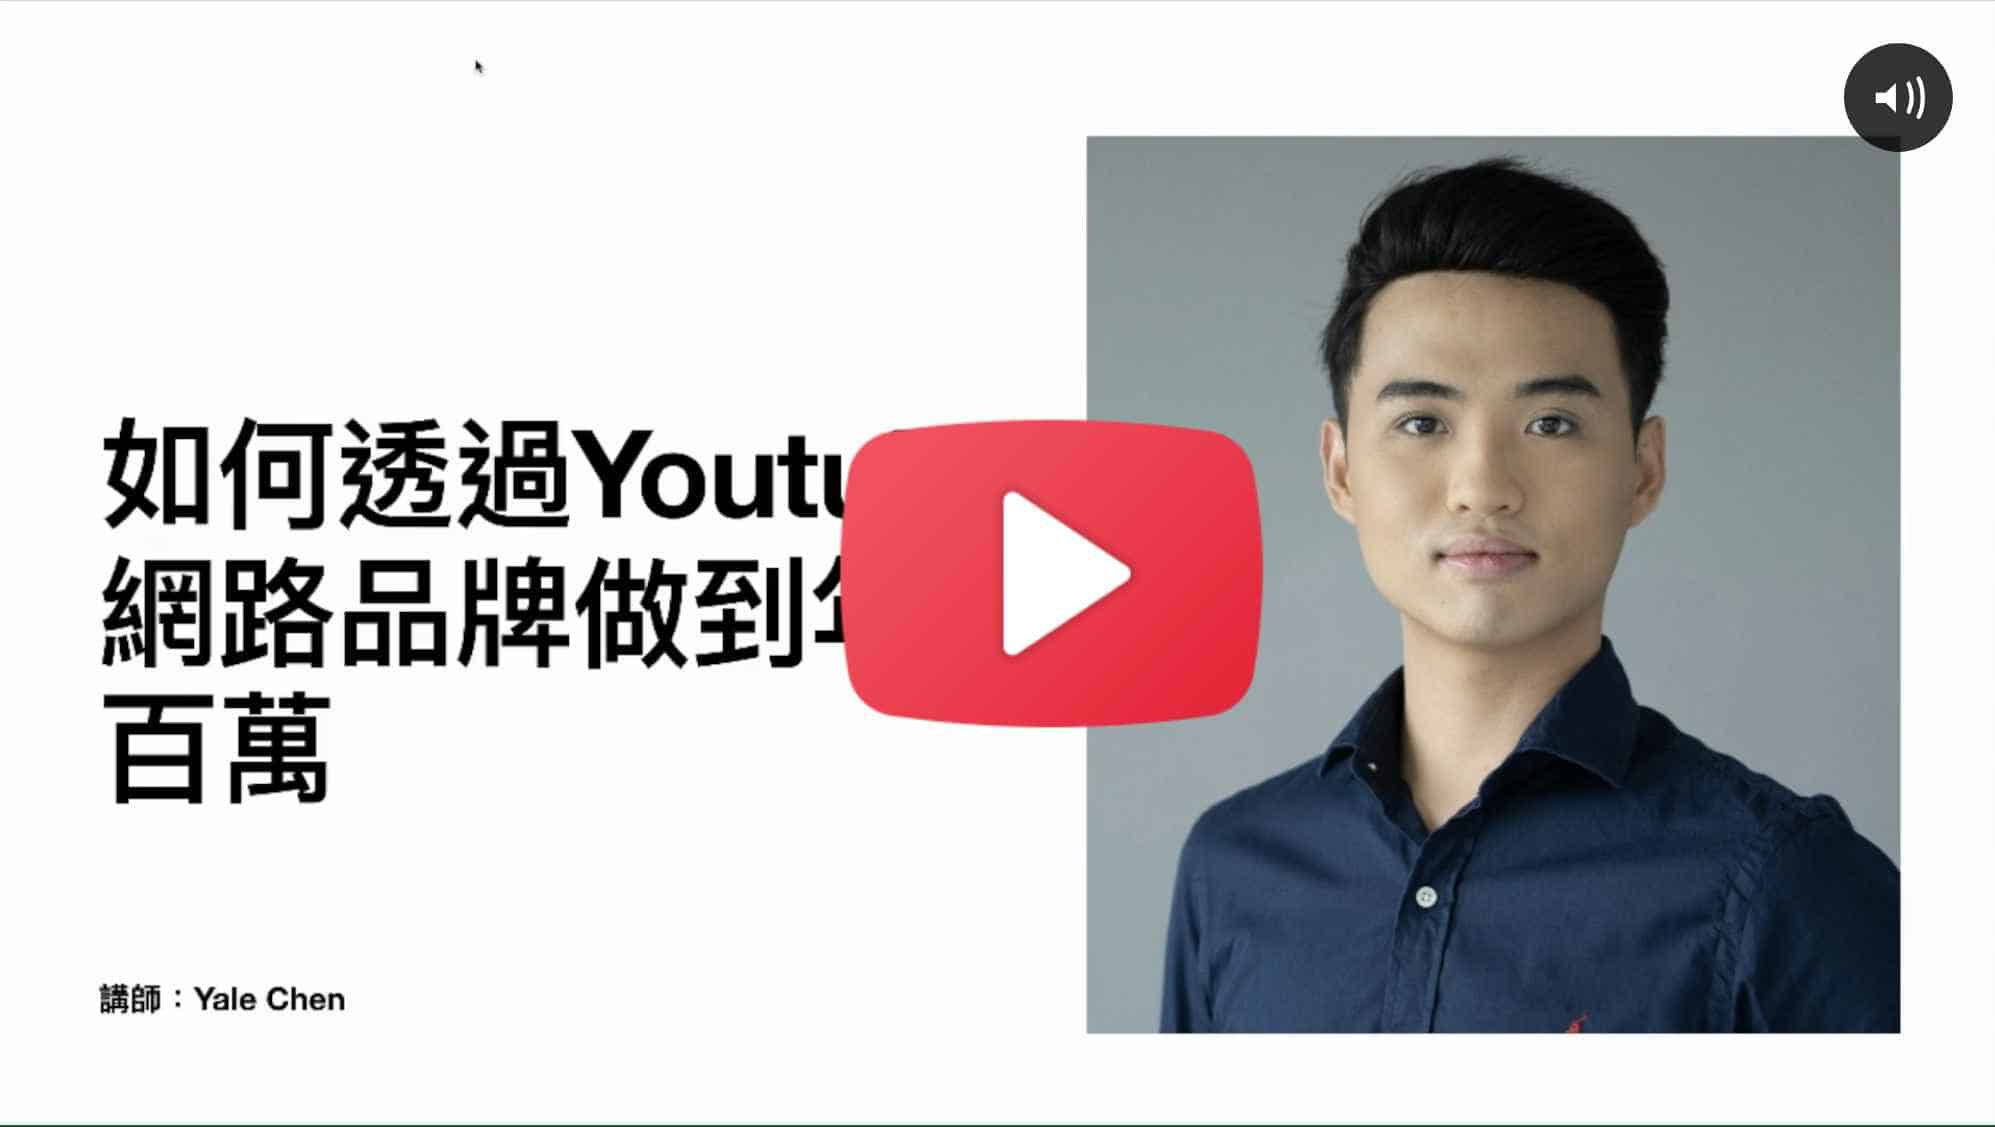 yale chen 百萬課程免費影片